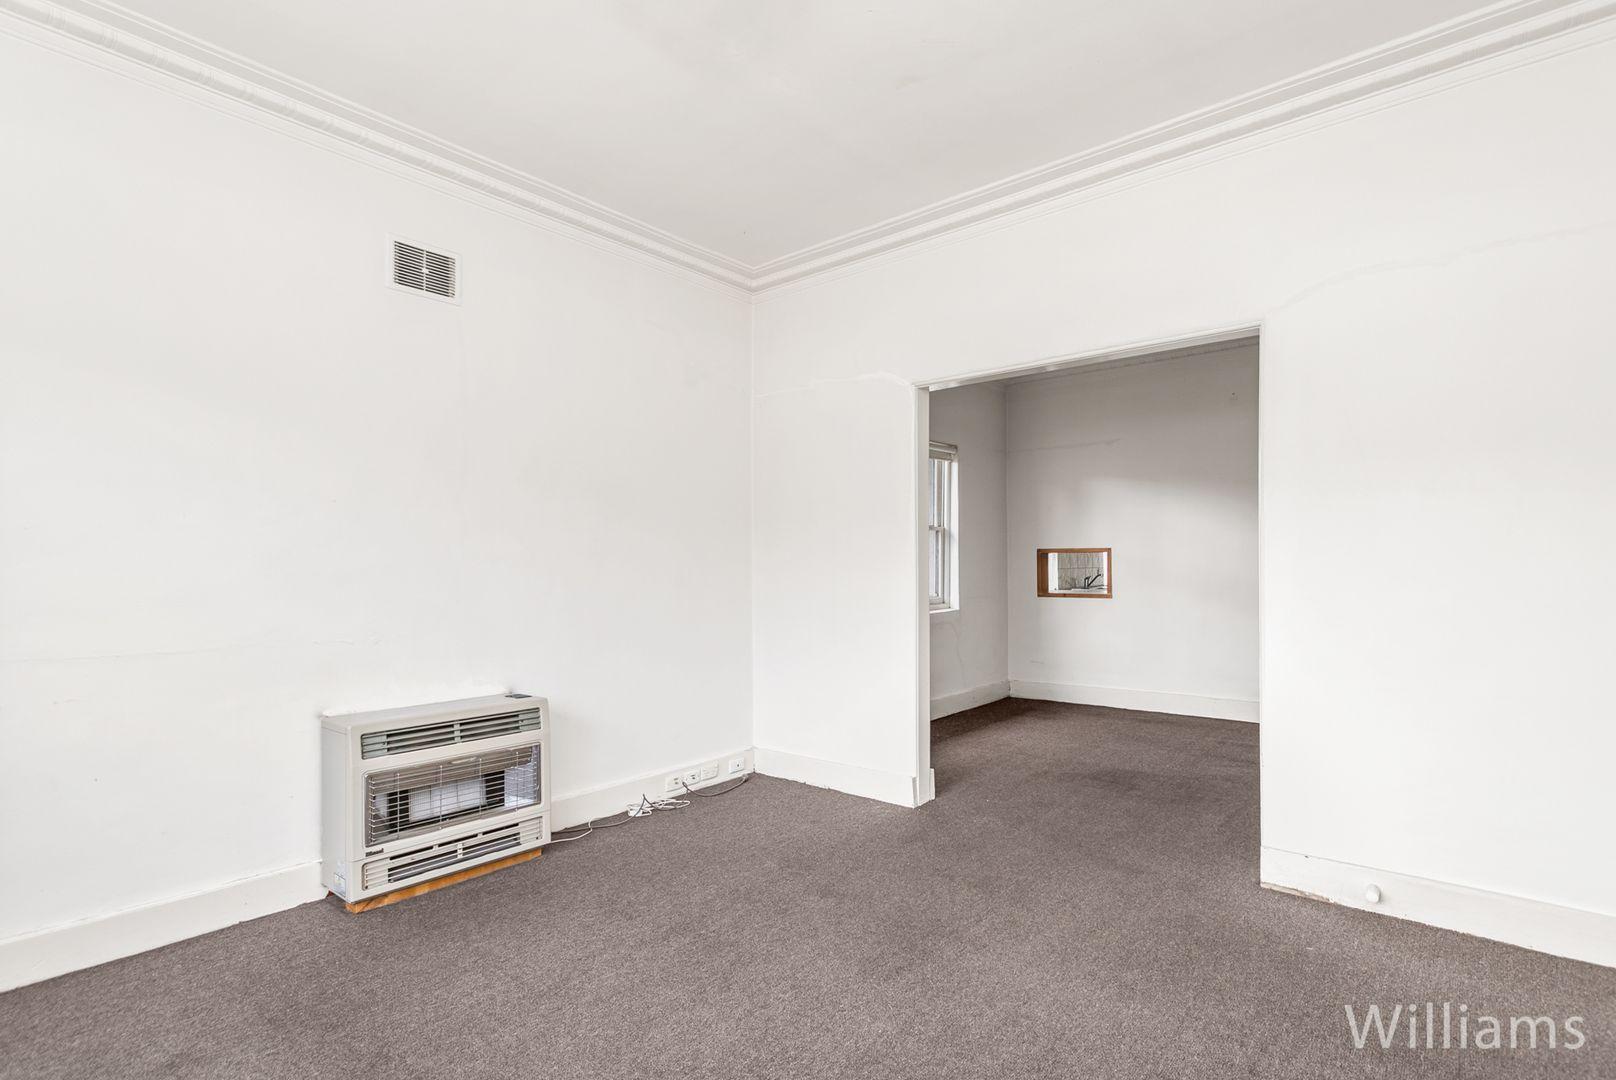 54 Hick Street, Spotswood VIC 3015, Image 2